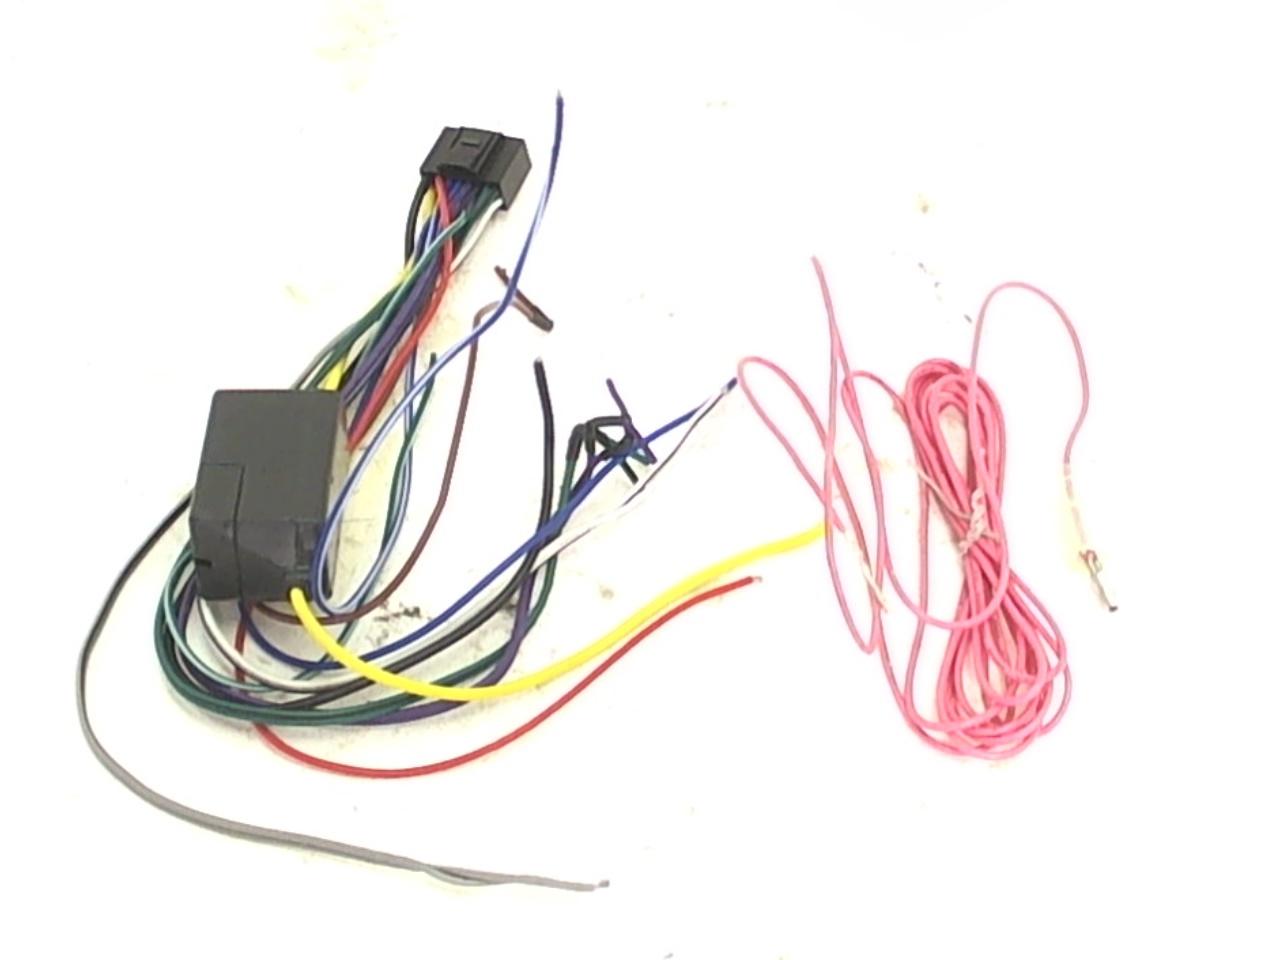 Jensen Uv10 Wire Harness Schematics Wiring Diagrams Diagram Vm9215bt Library Of U2022 Rh Sv Ti Com Rear